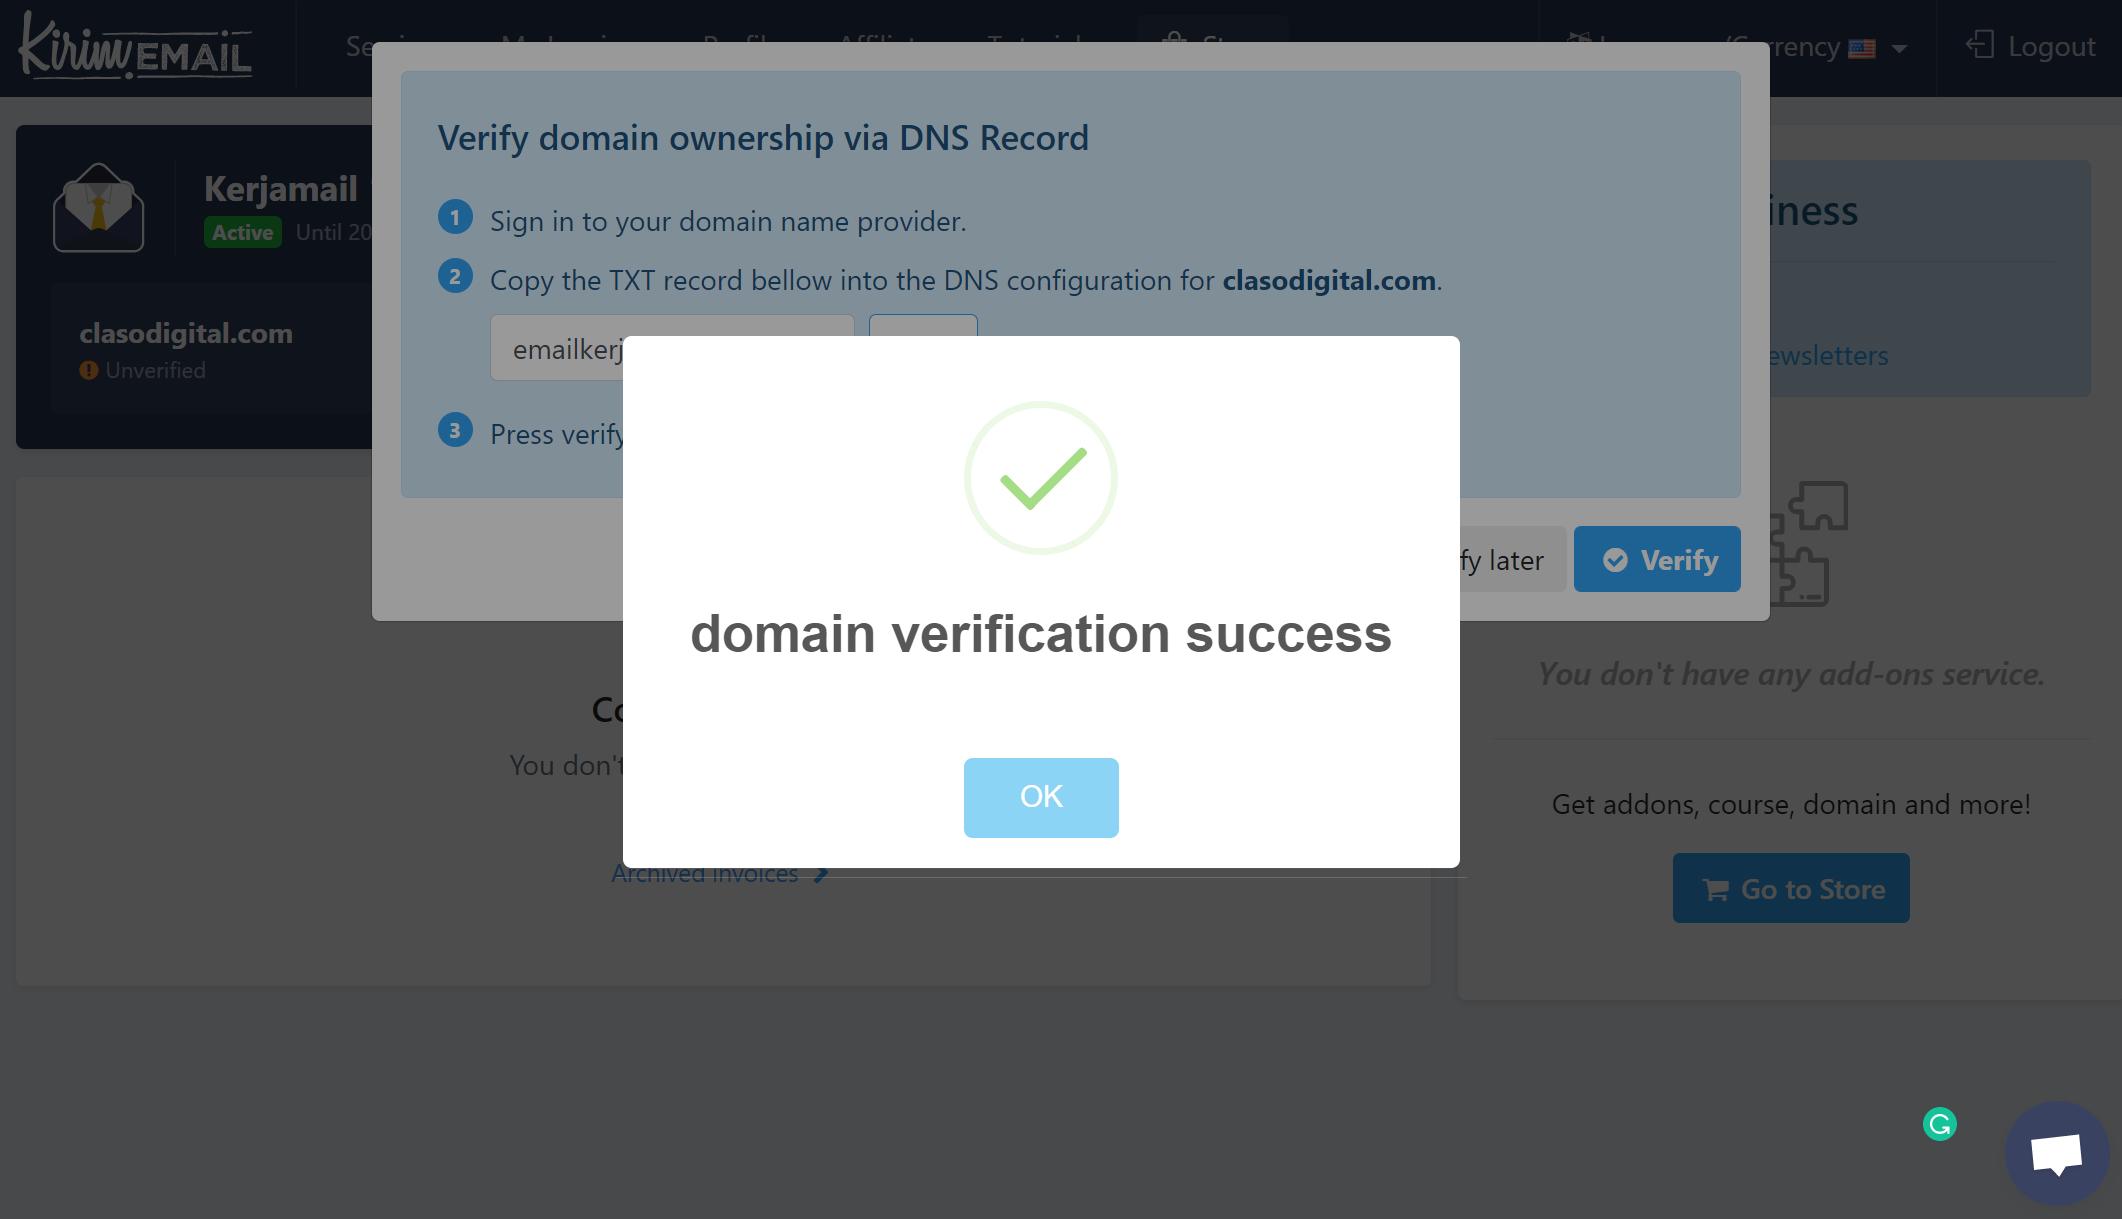 Kerjamail - Domain Verification